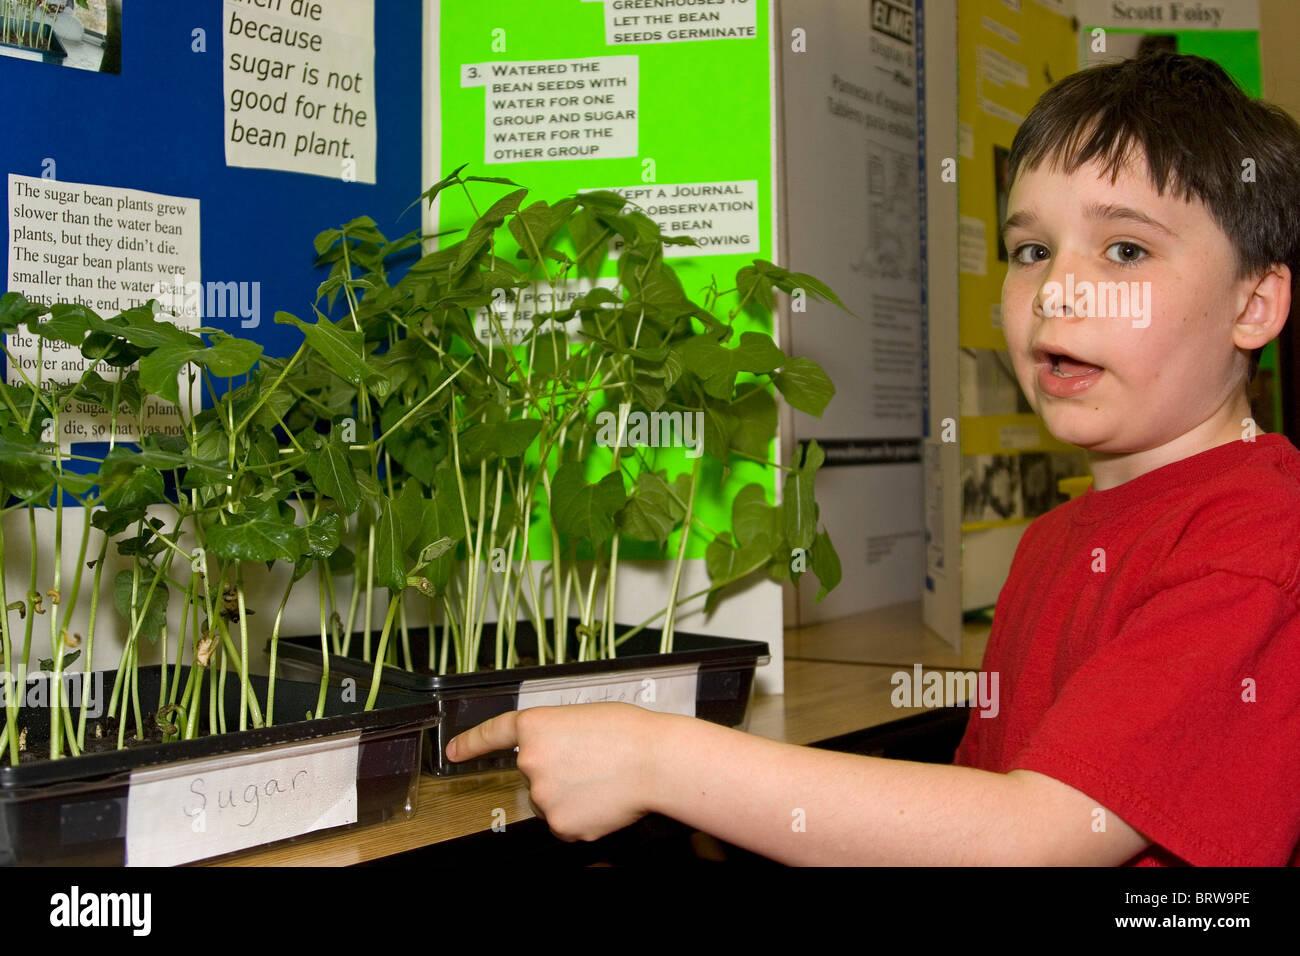 An Elementary School Boy Explains His Science Fair Project